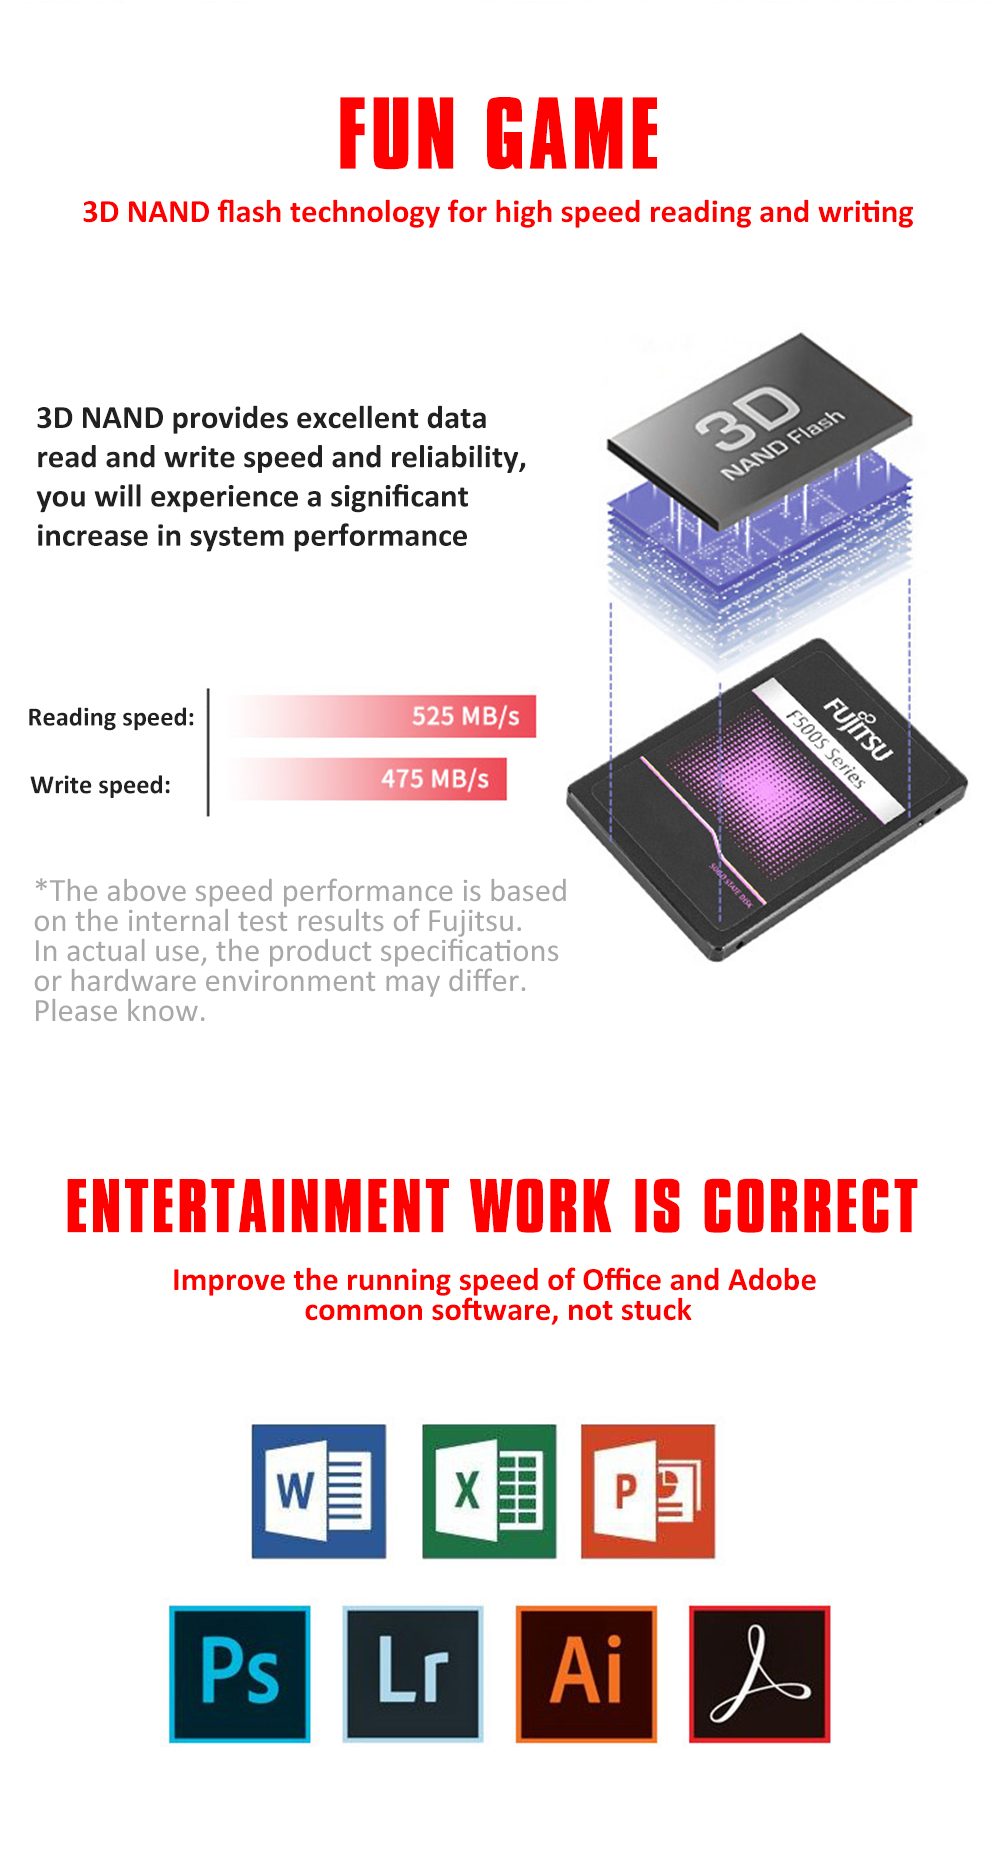 "FUJITSU 2.5"" ssd 1tb sata3 ssd 1024G 3D NAND Flash SMI/Phison/Realtek TLC ssd hard drive Solid State Drives for desktop laptop 19"